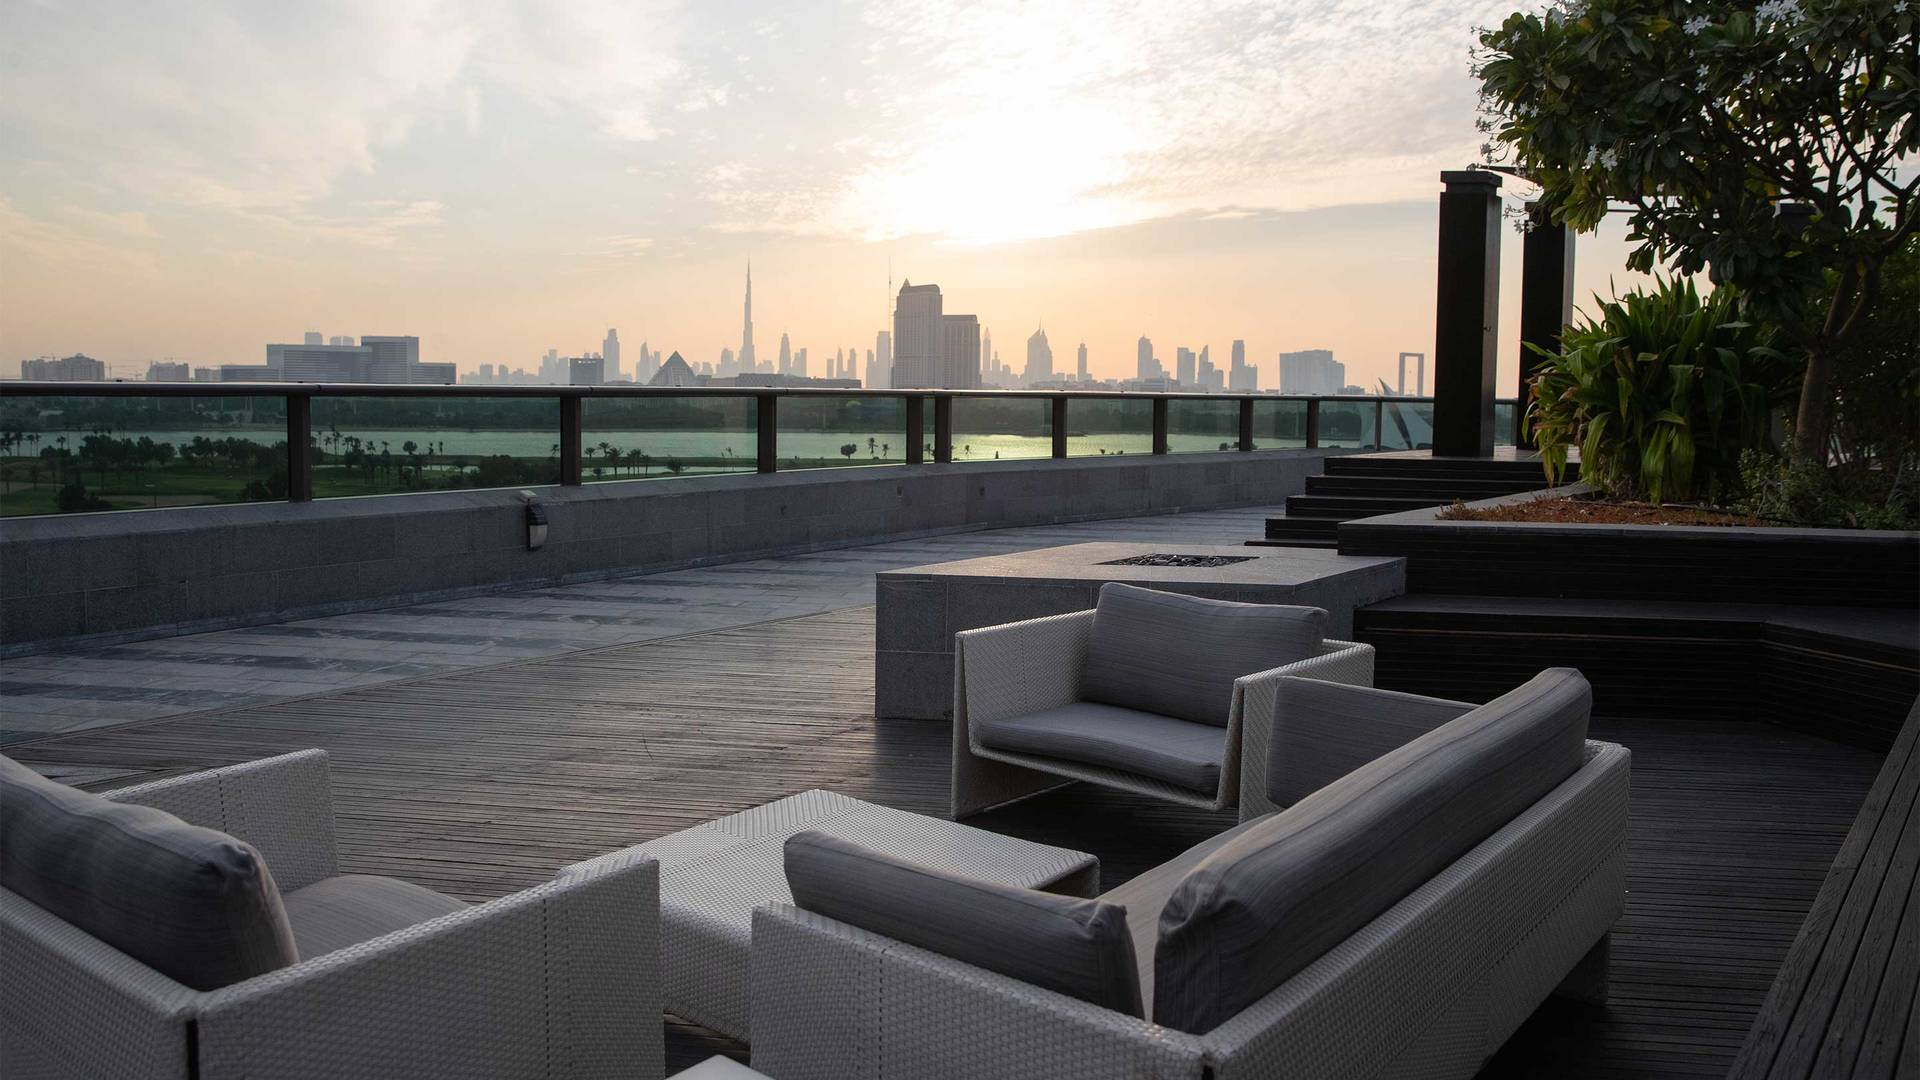 16-9_creekside_Jumeirah-Creekside-Hotel---Penthouse-Suite-Terrace